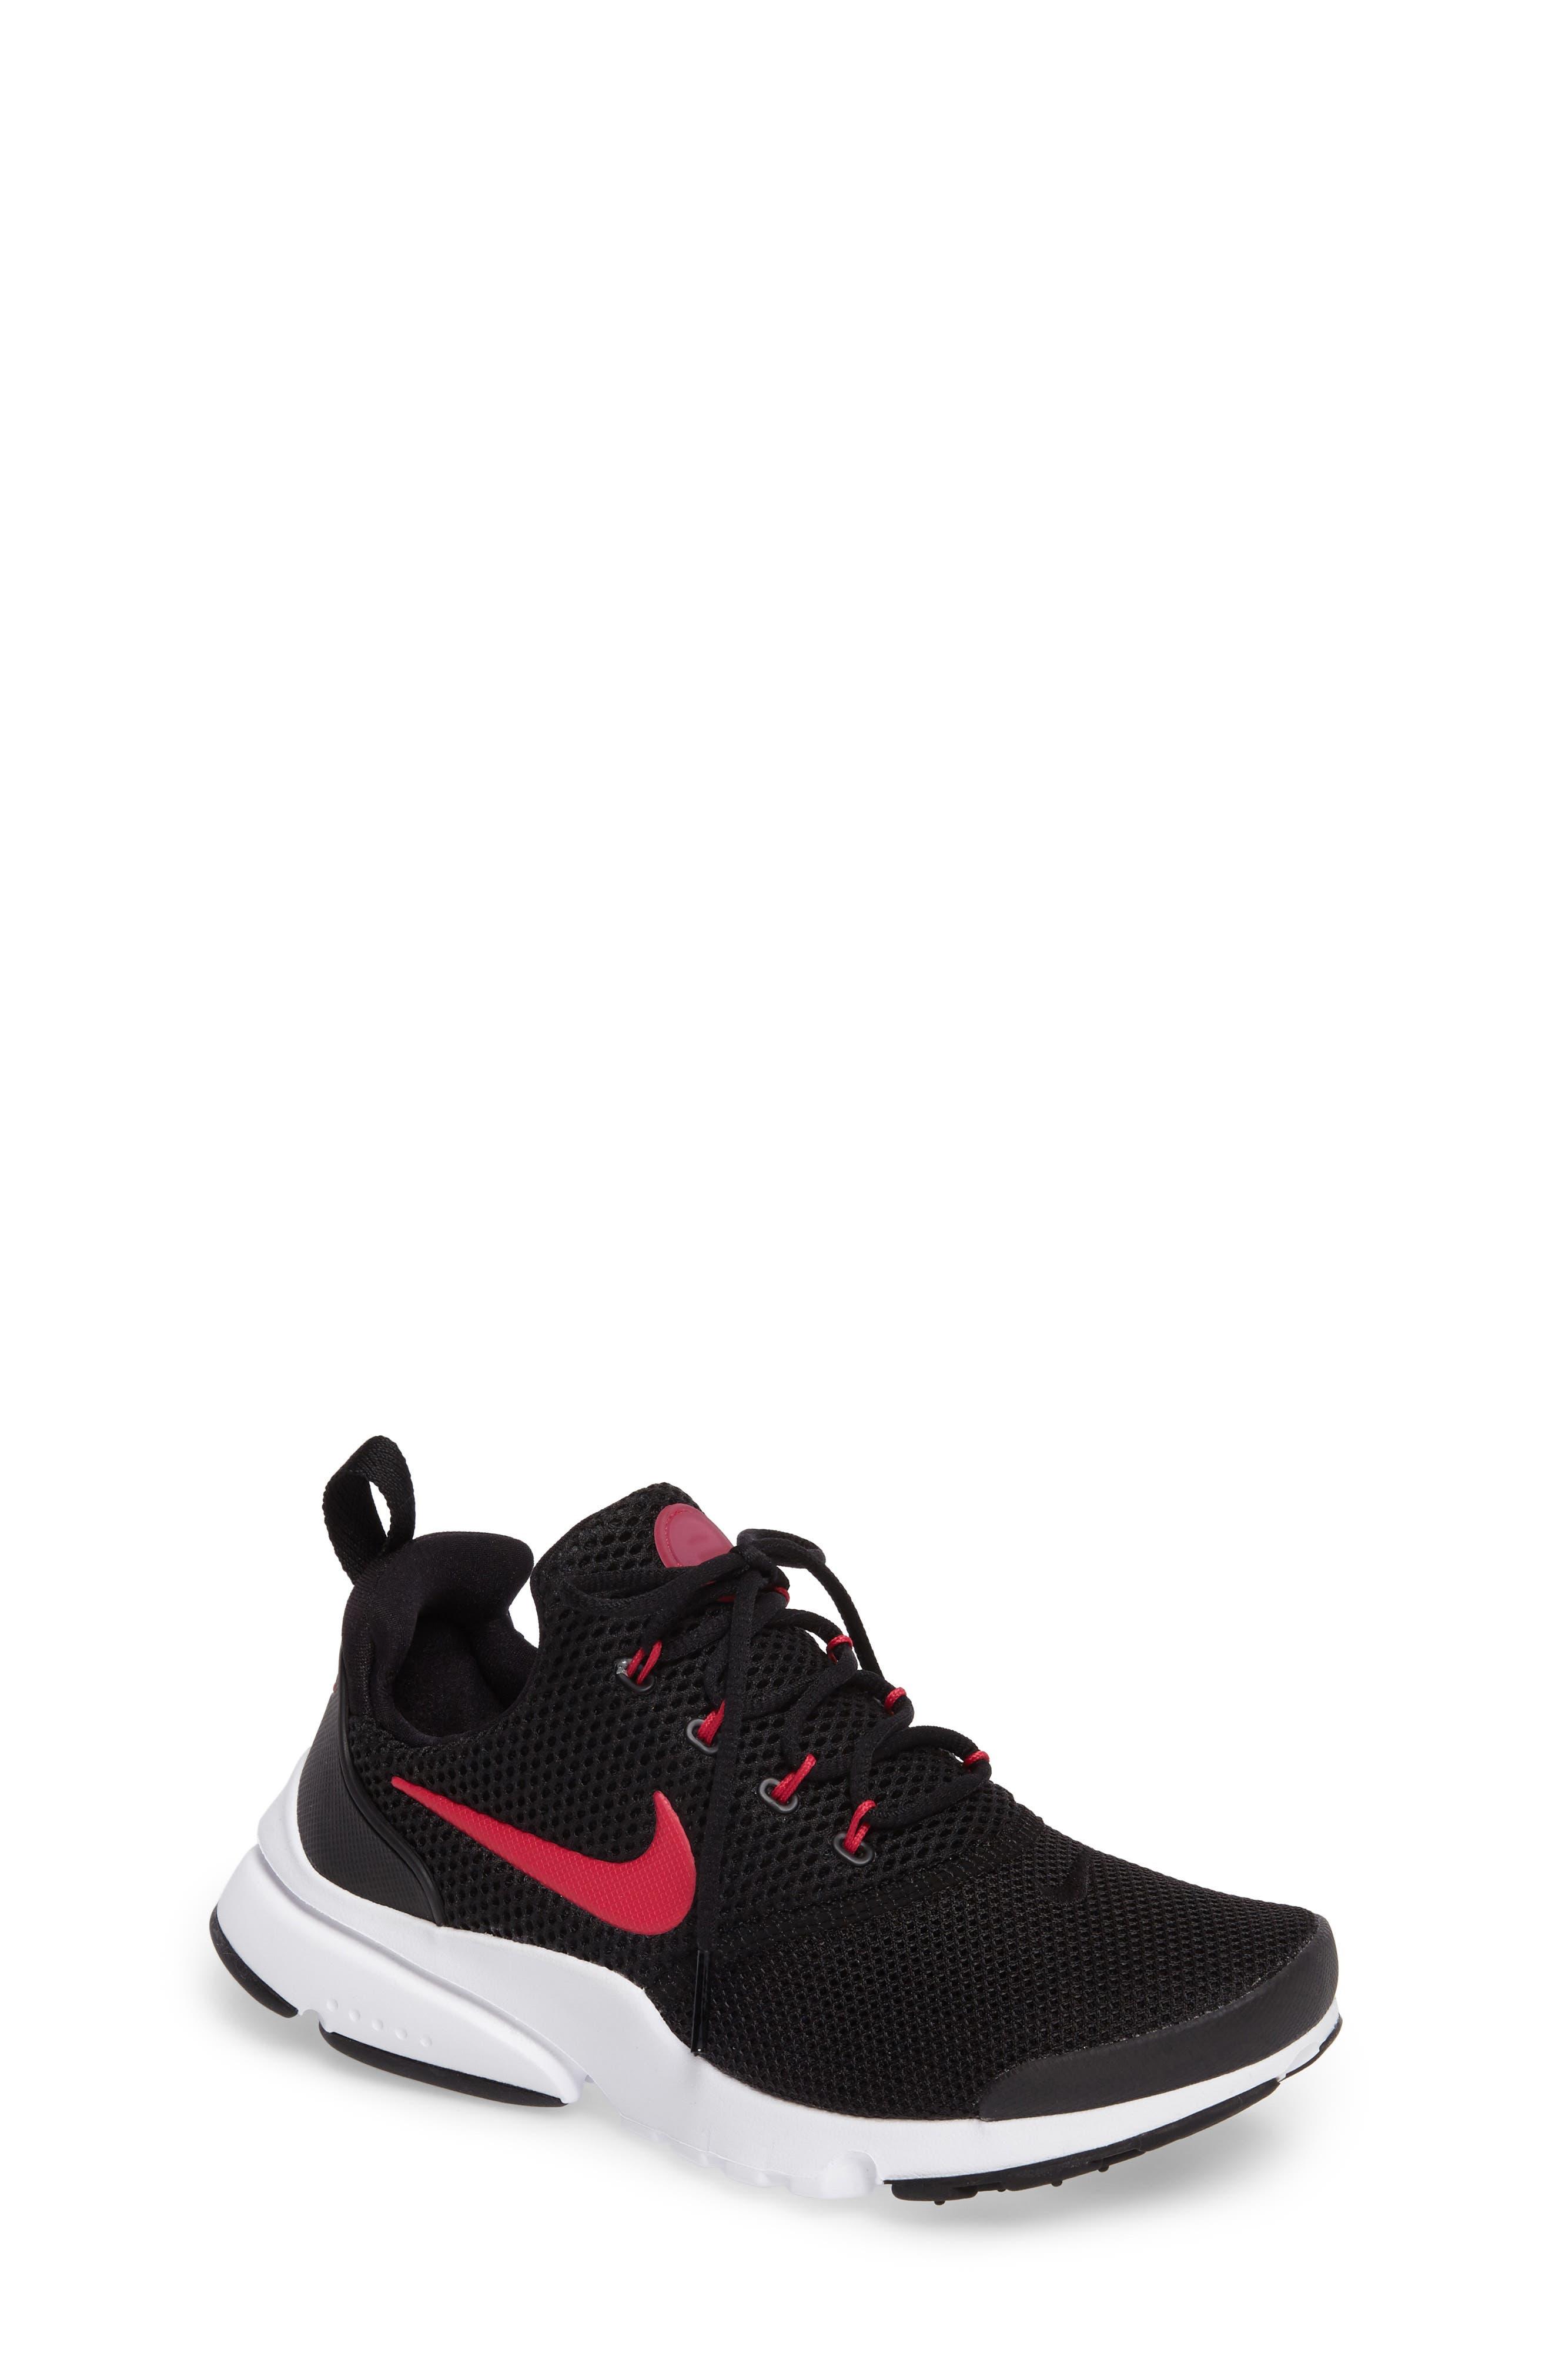 Main Image - Nike Presto Fly Sneaker (Big Kid)